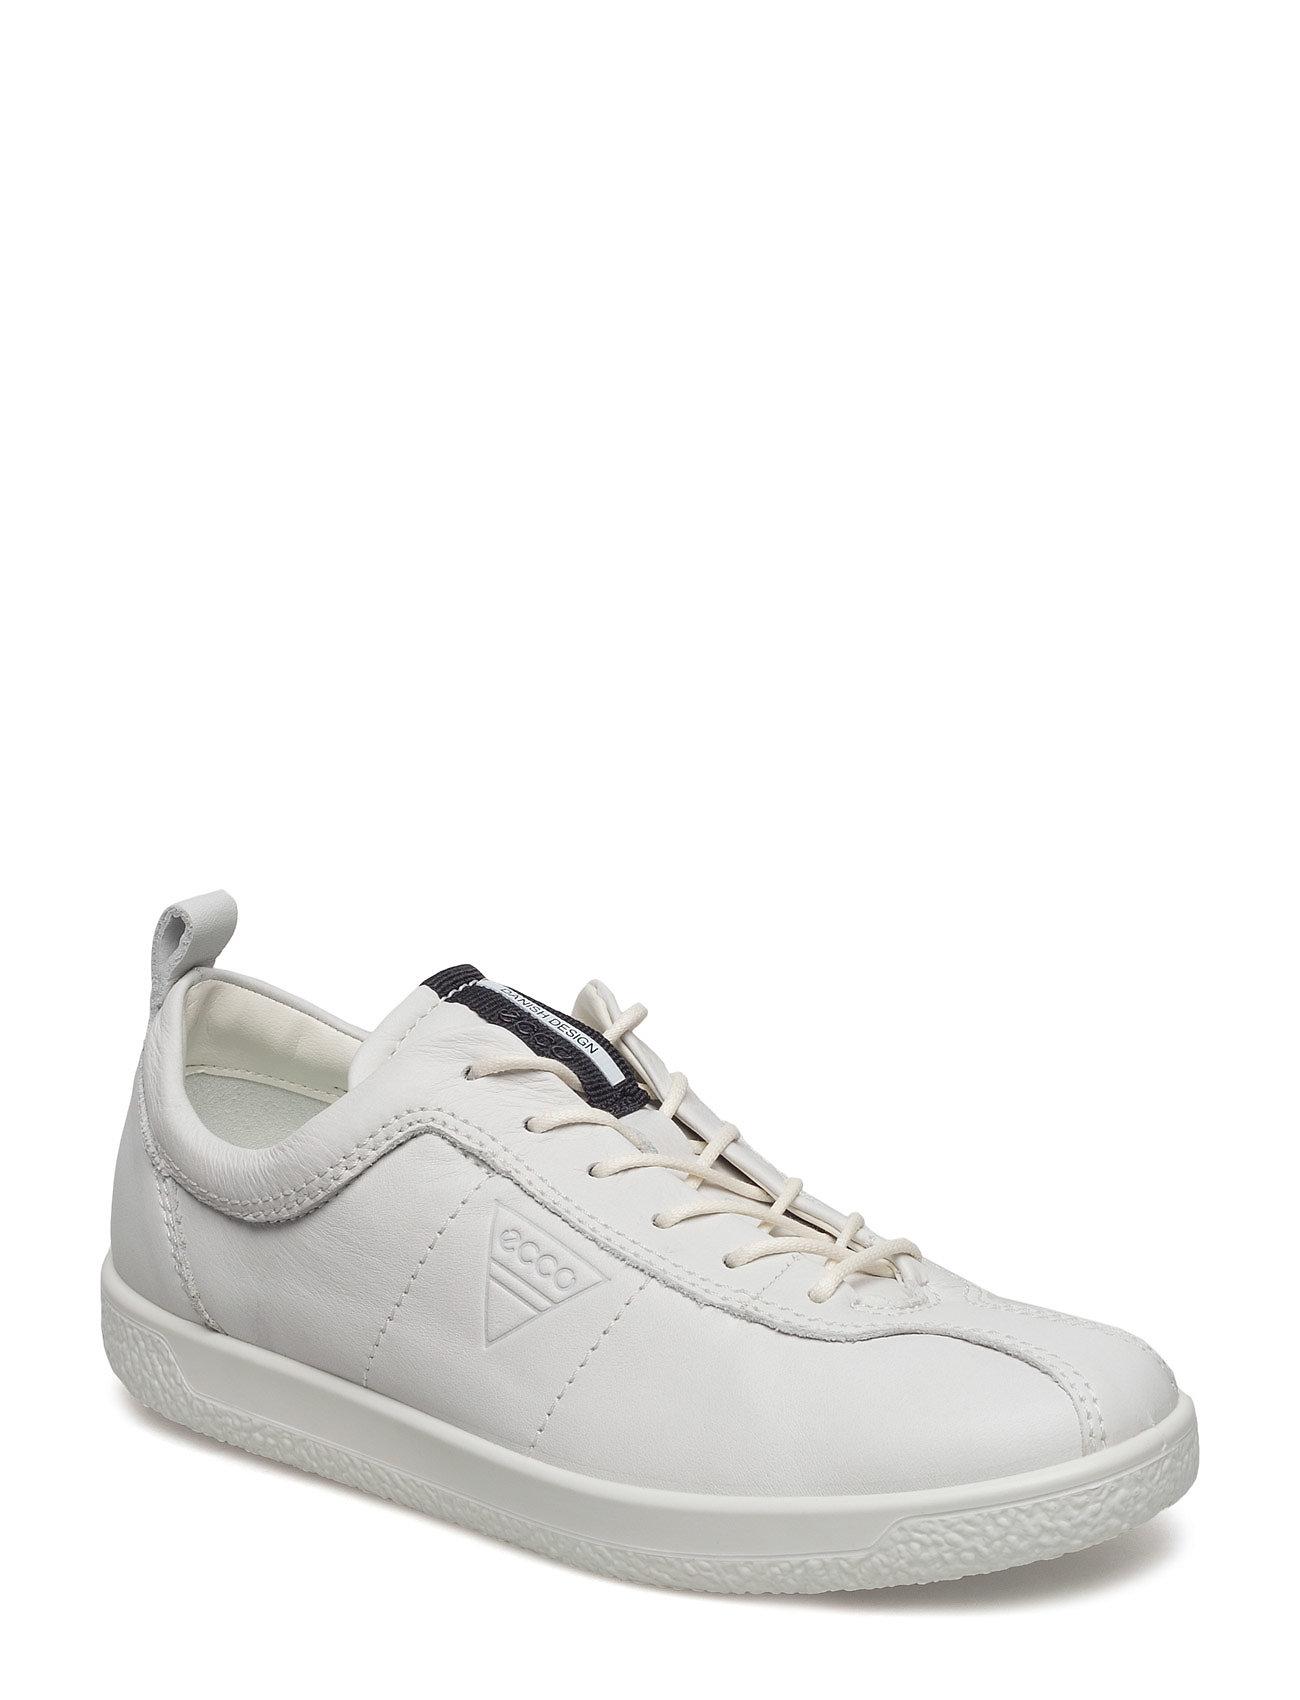 Soft 1 Ladies ECCO Sneakers til Damer i hvid